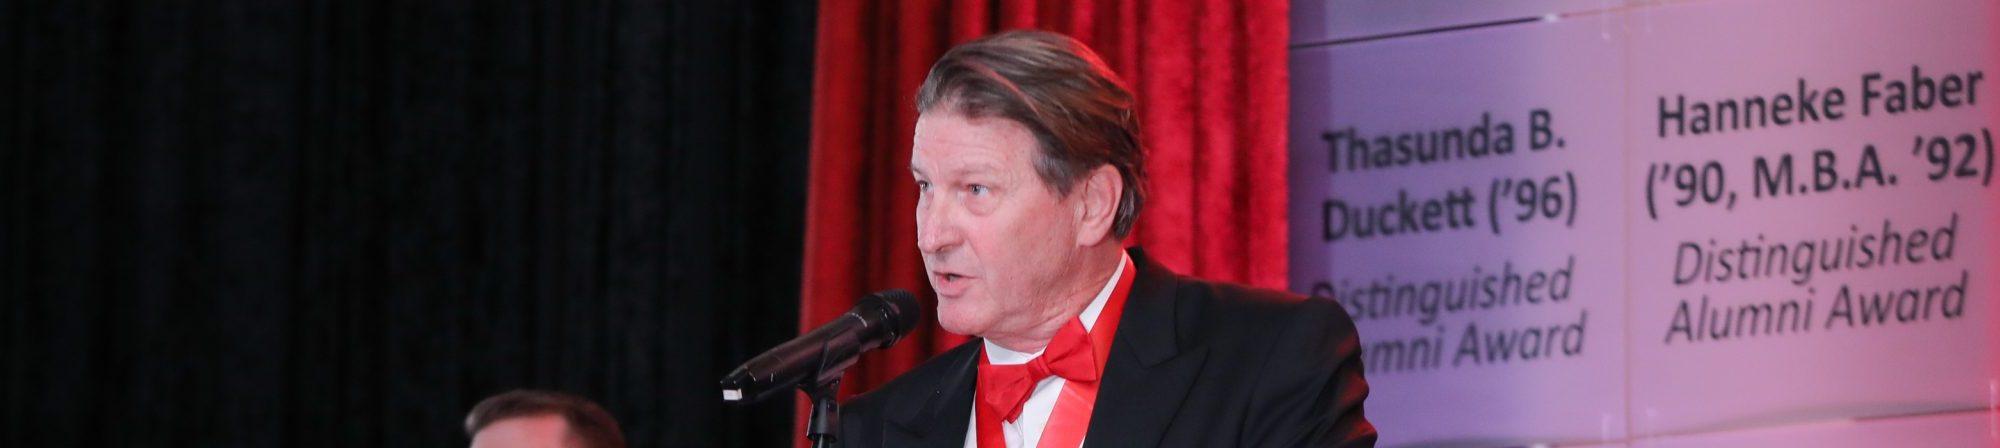 Brett-Cullen at the UHAA alumni gala awards